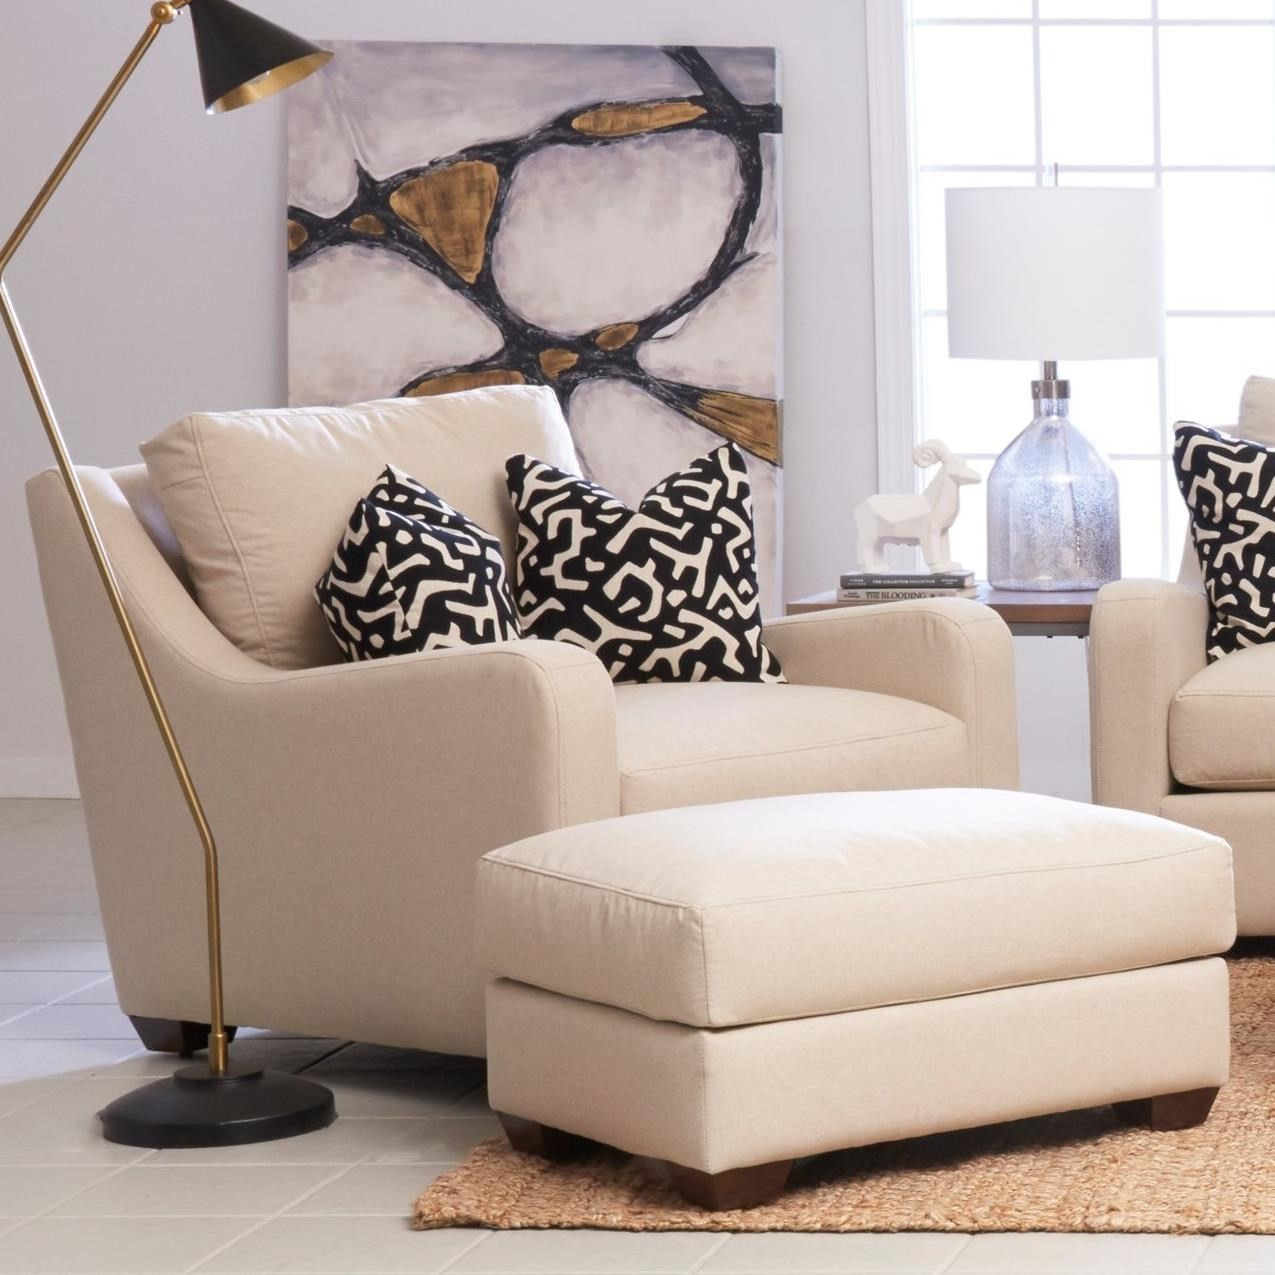 Klaussner Pandora (Distinctions By Klaussner) Big Chair And Ottoman Set    Royal Furniture   Chair U0026 Ottoman Sets